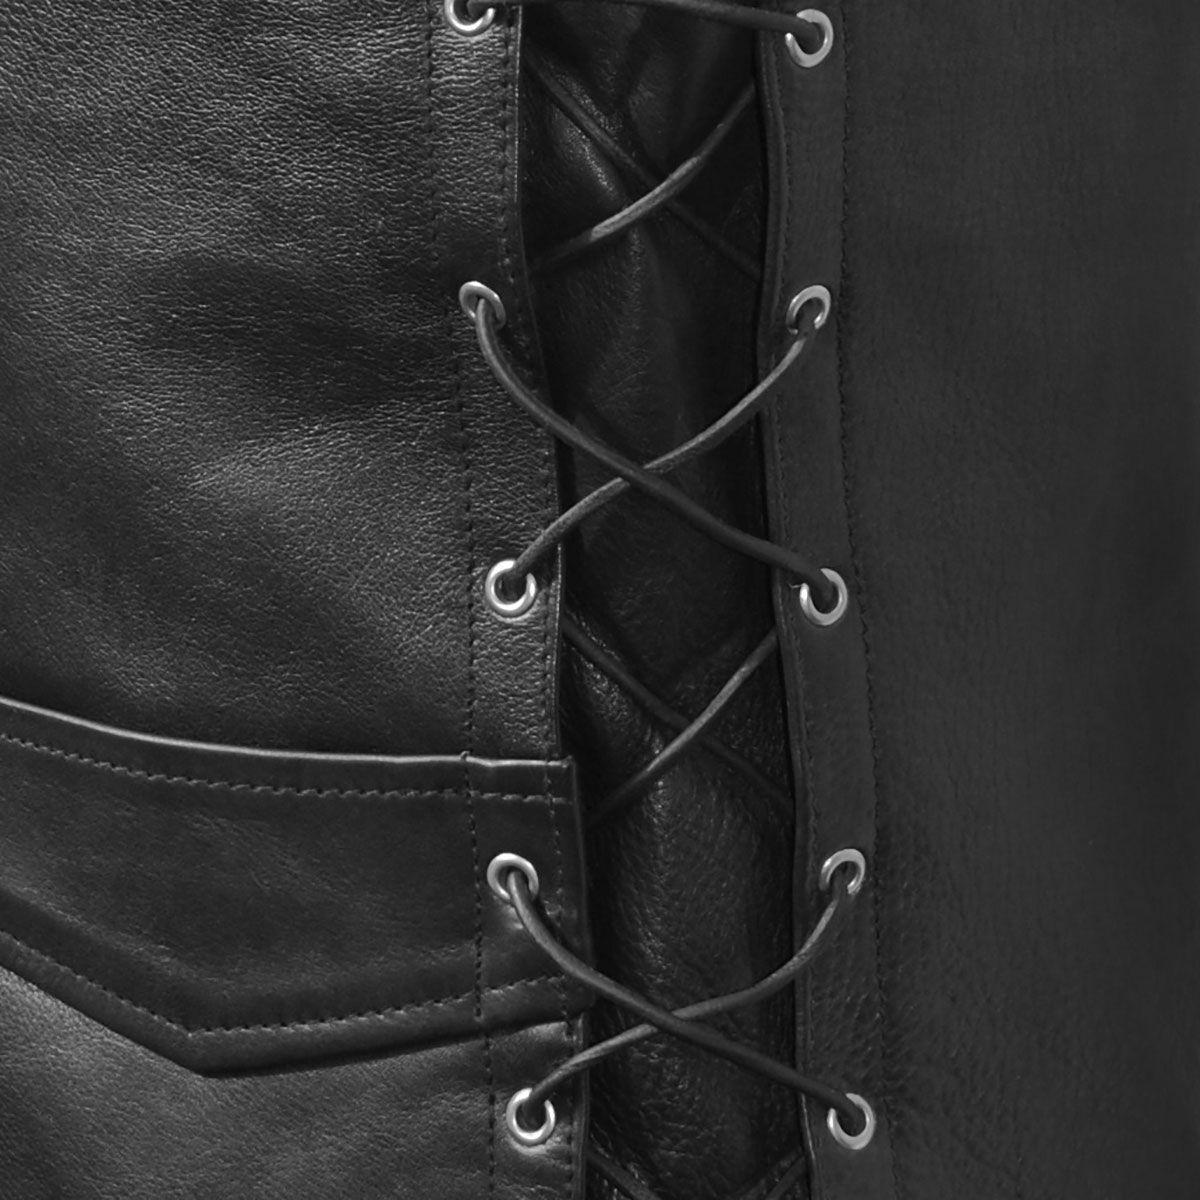 Veste sans manche cuir motard